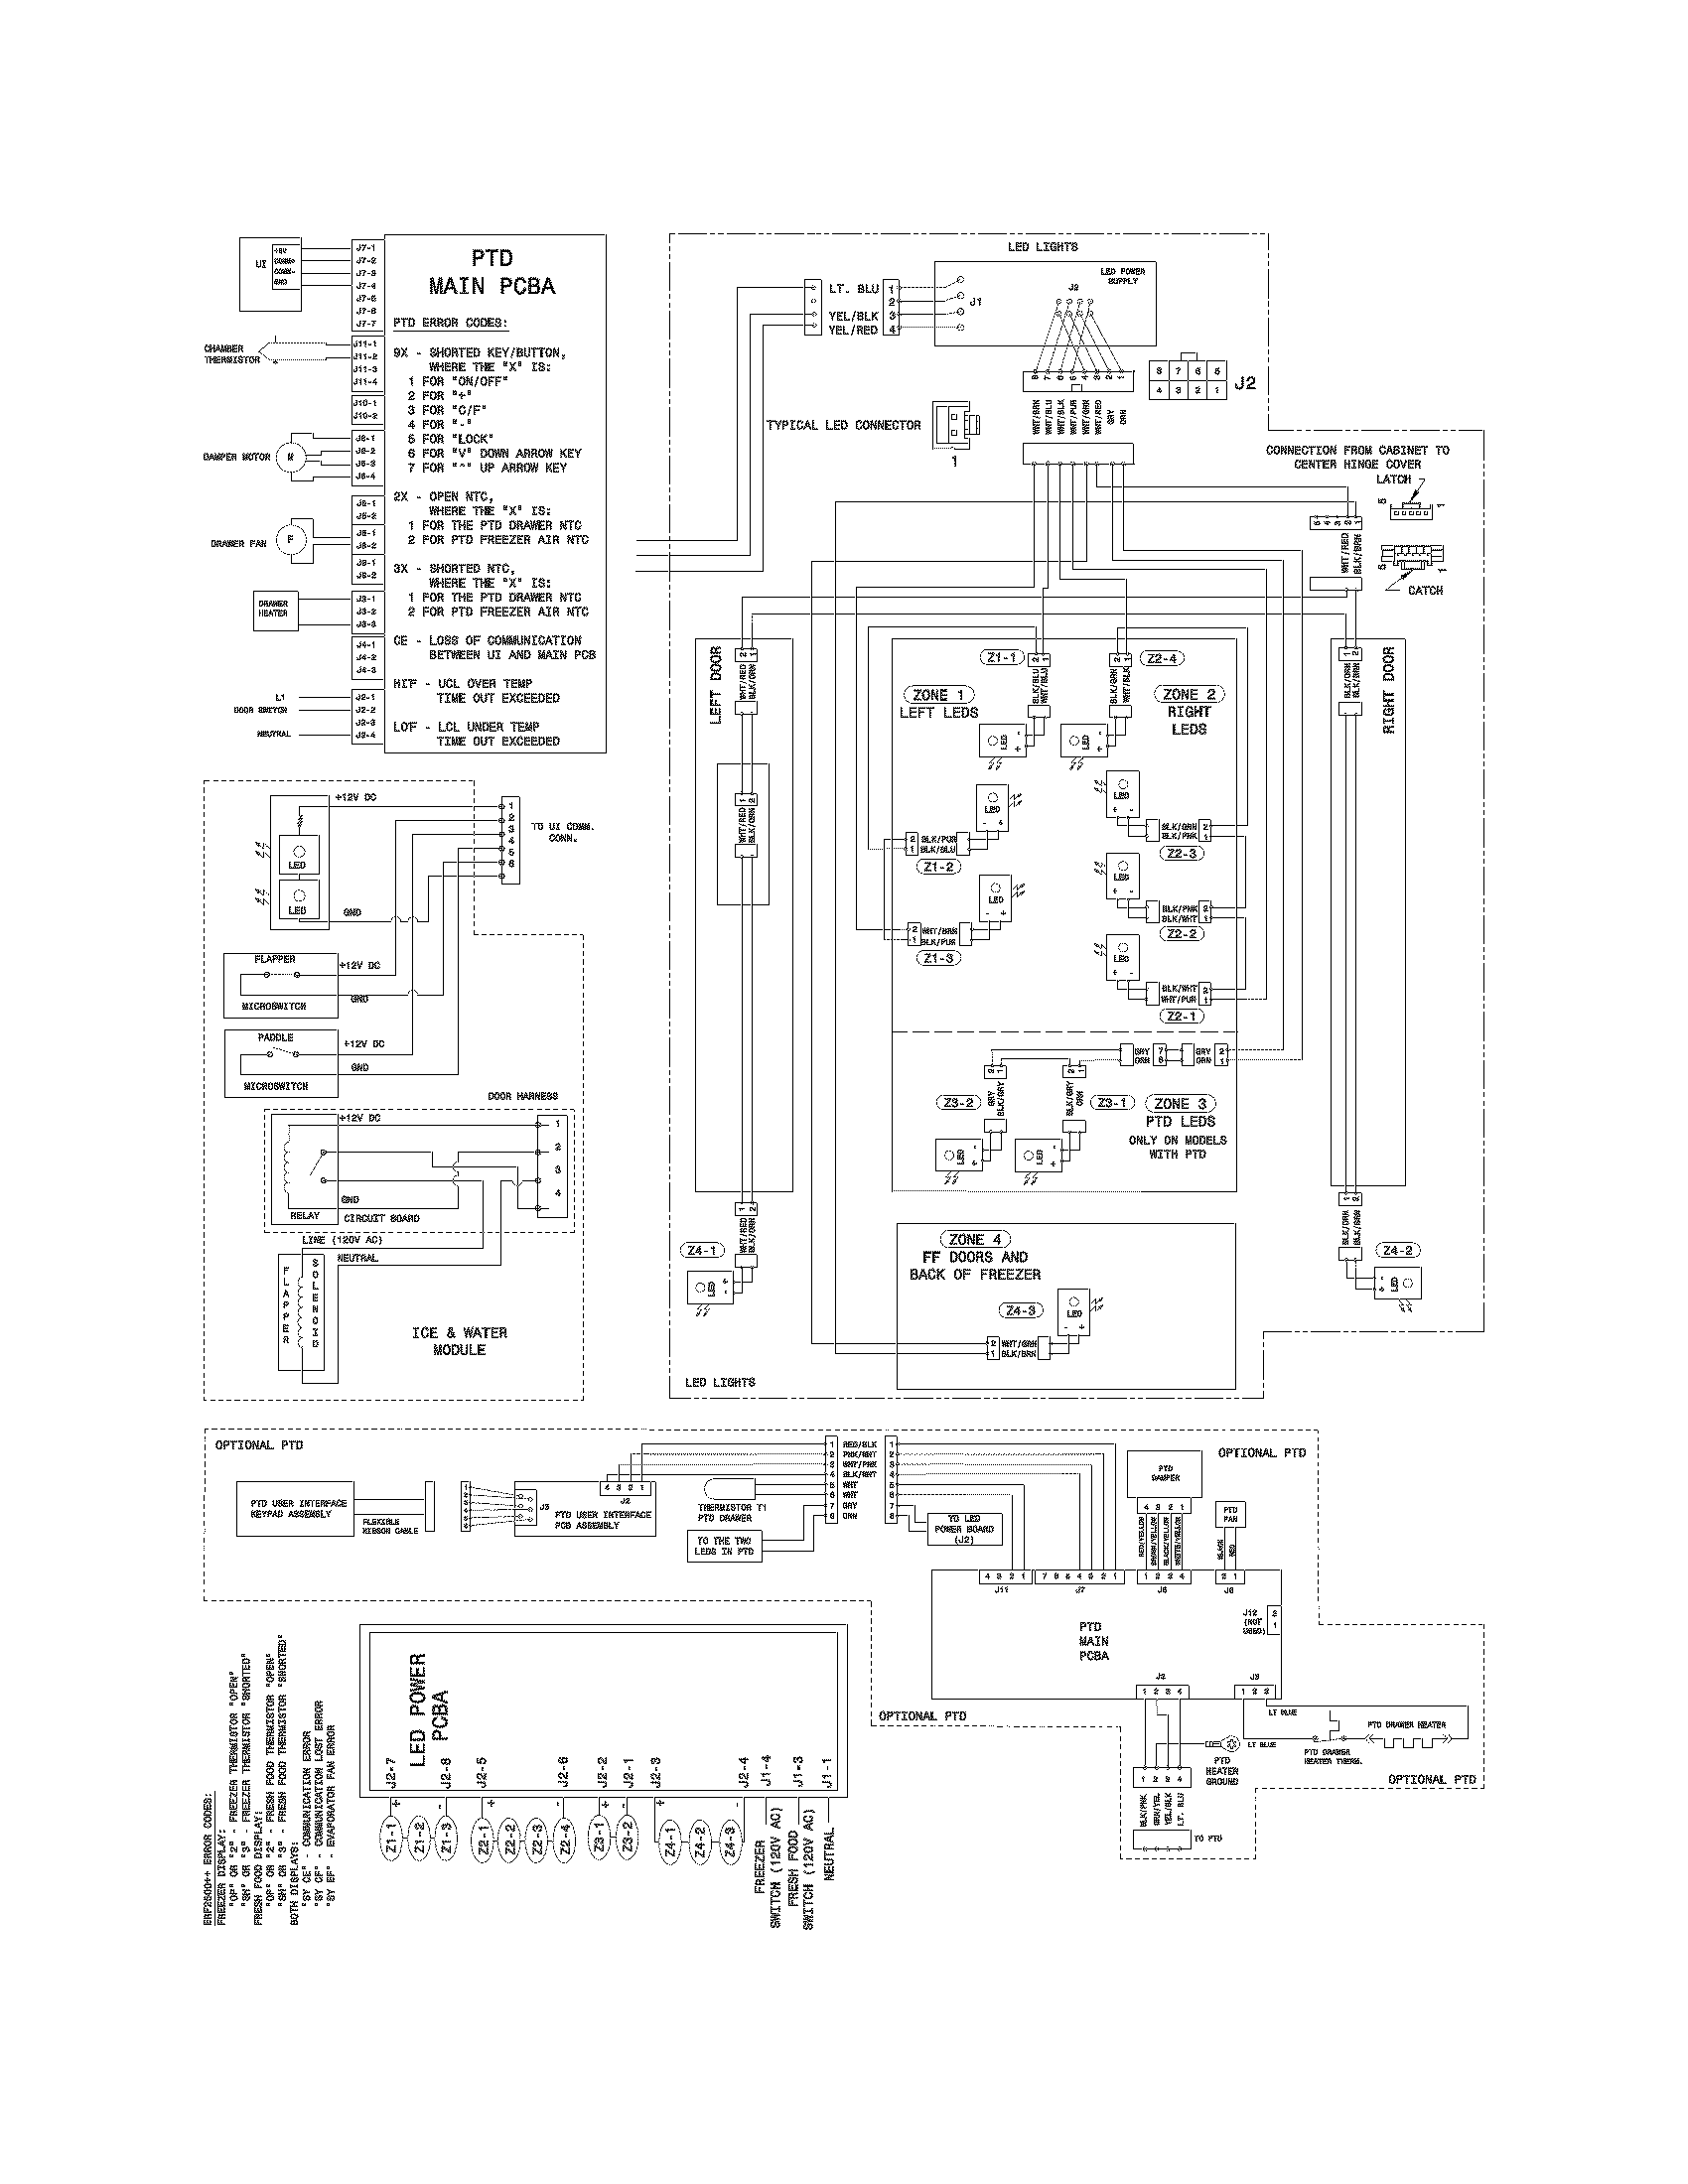 R1303093 00011?resize\=665%2C861 rexair wiring diagram pinout diagrams, snatch block diagrams Electrolux Vacuum Parts Diagram at edmiracle.co